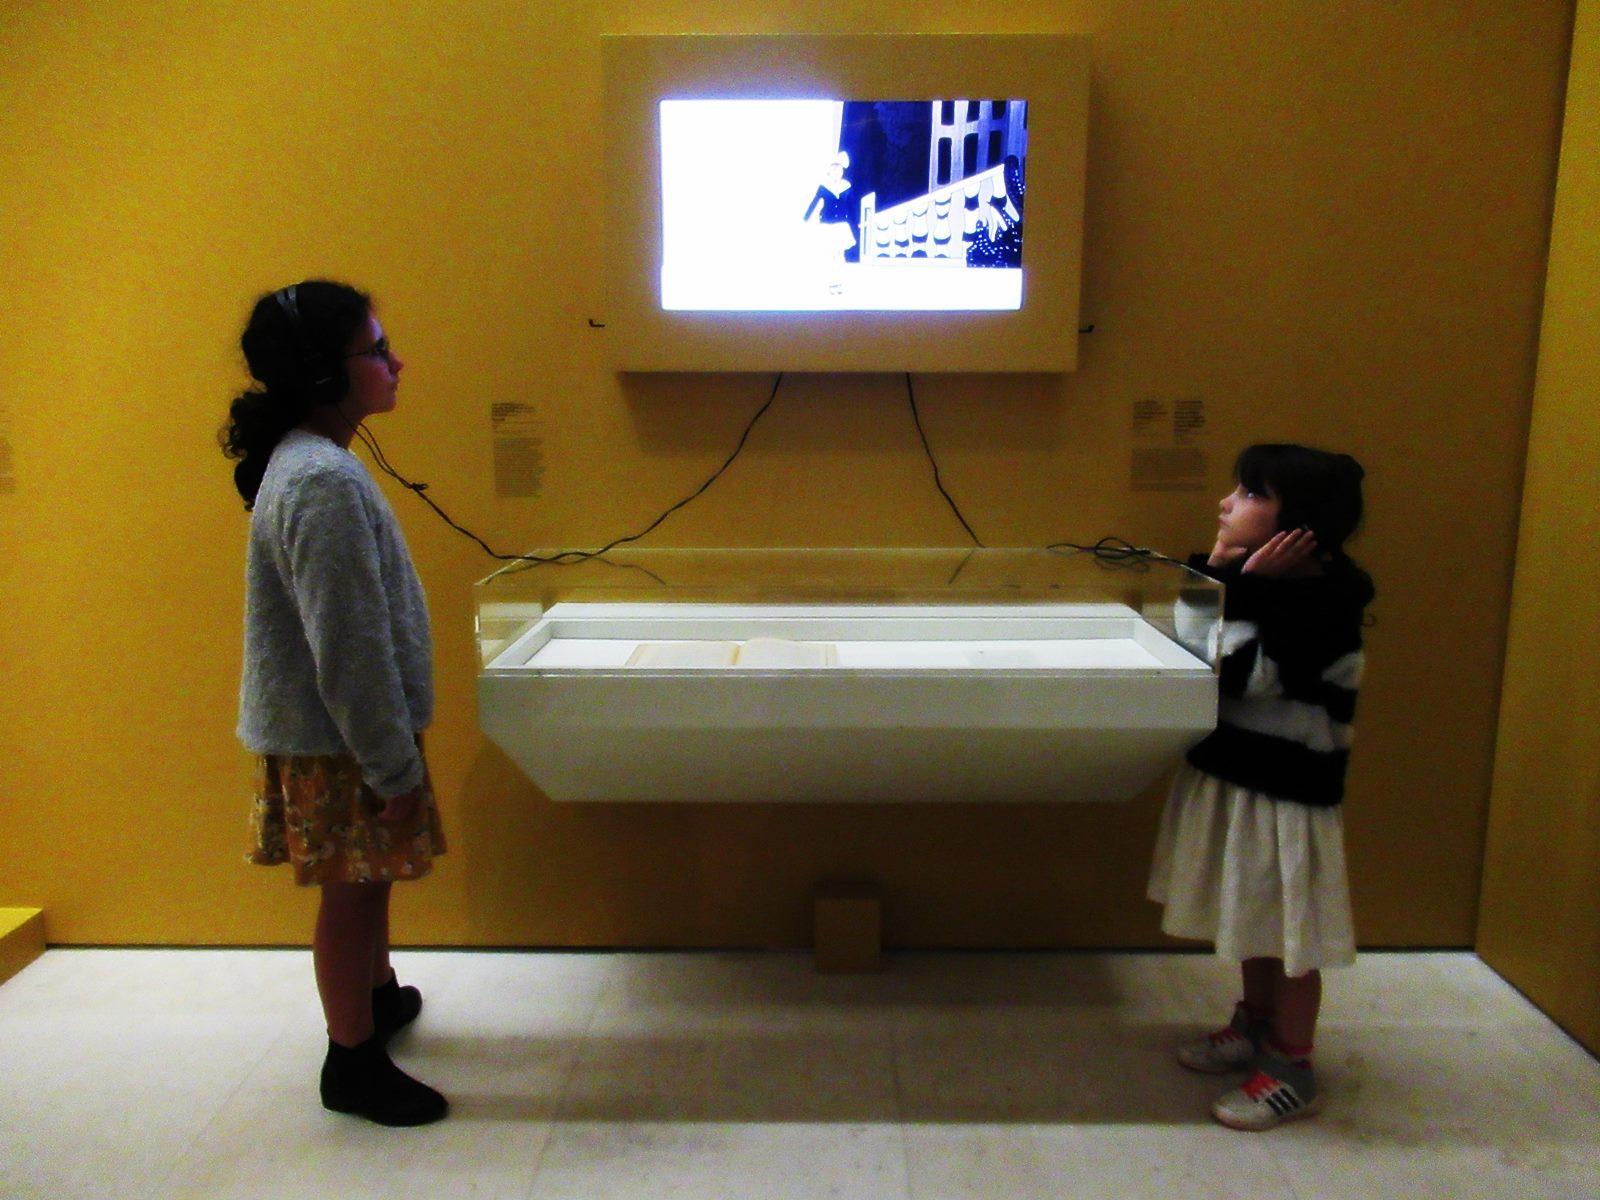 Exposition charlie chaplin nantes museeexposition charlie chaplin nantes 9